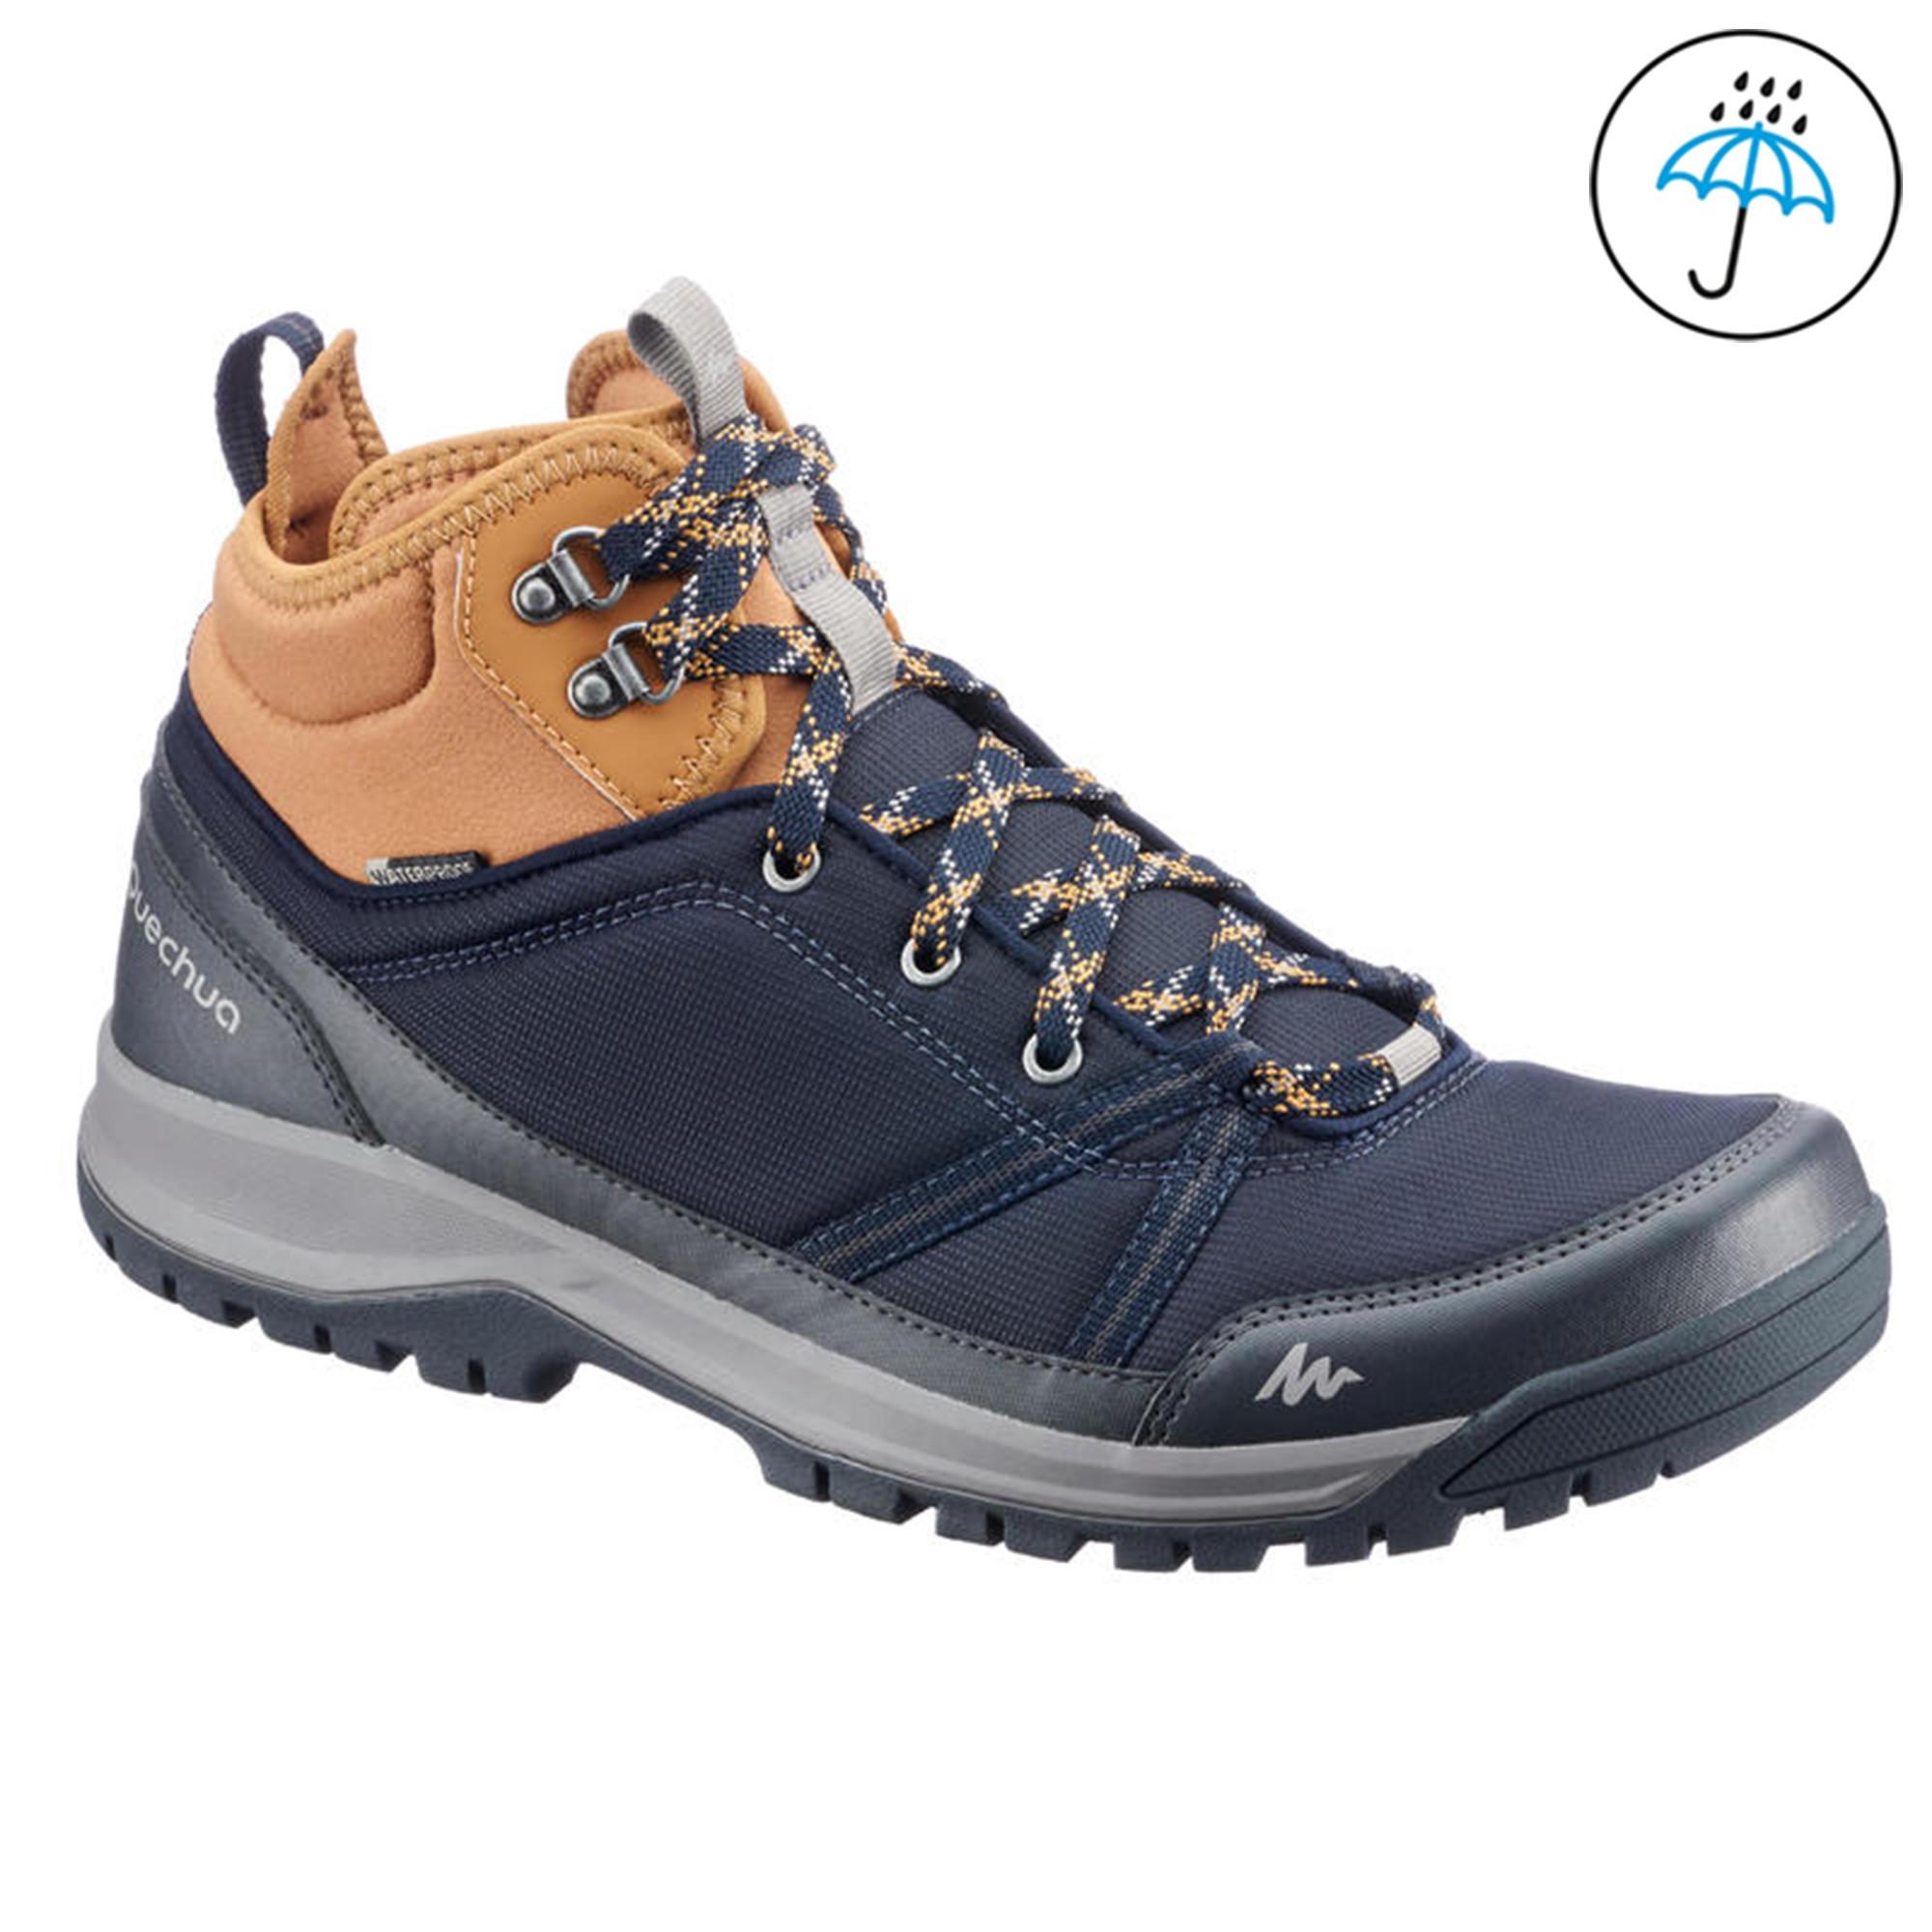 Men's Nature Hiking Shoes Online